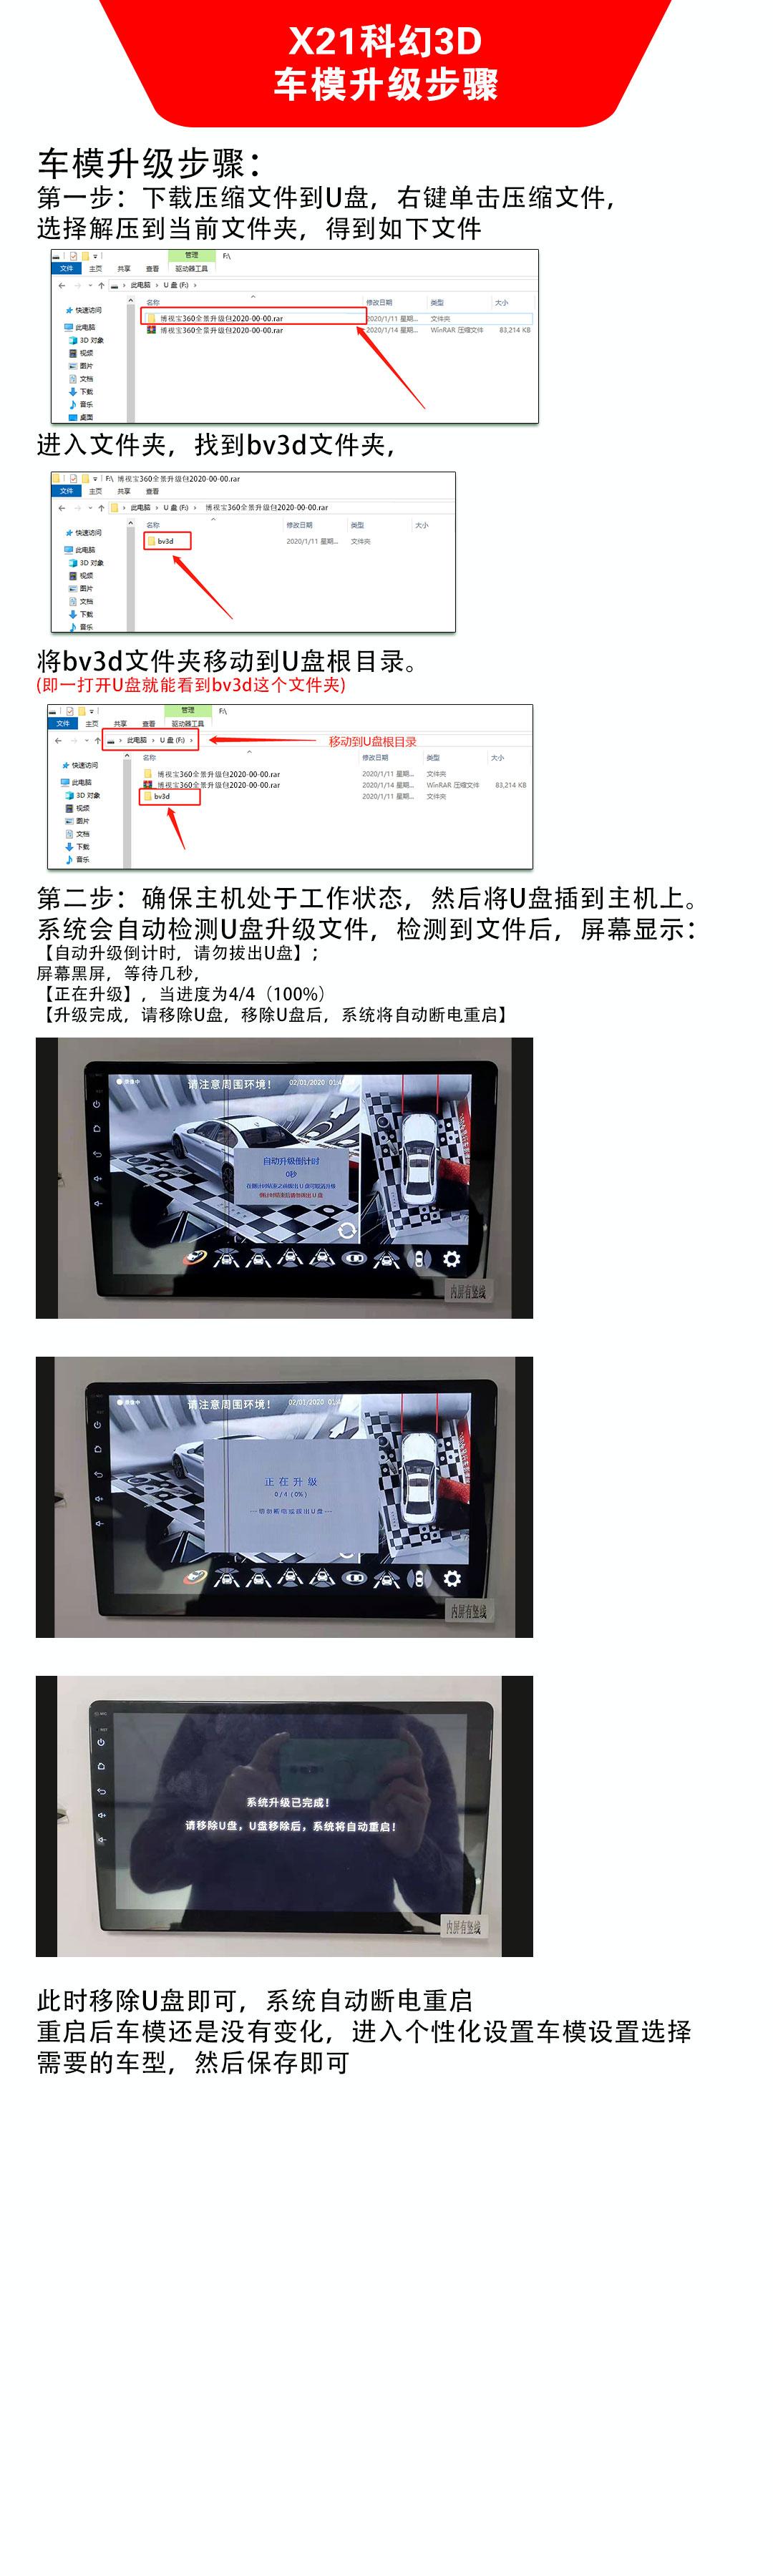 X21車模升級說明.jpg